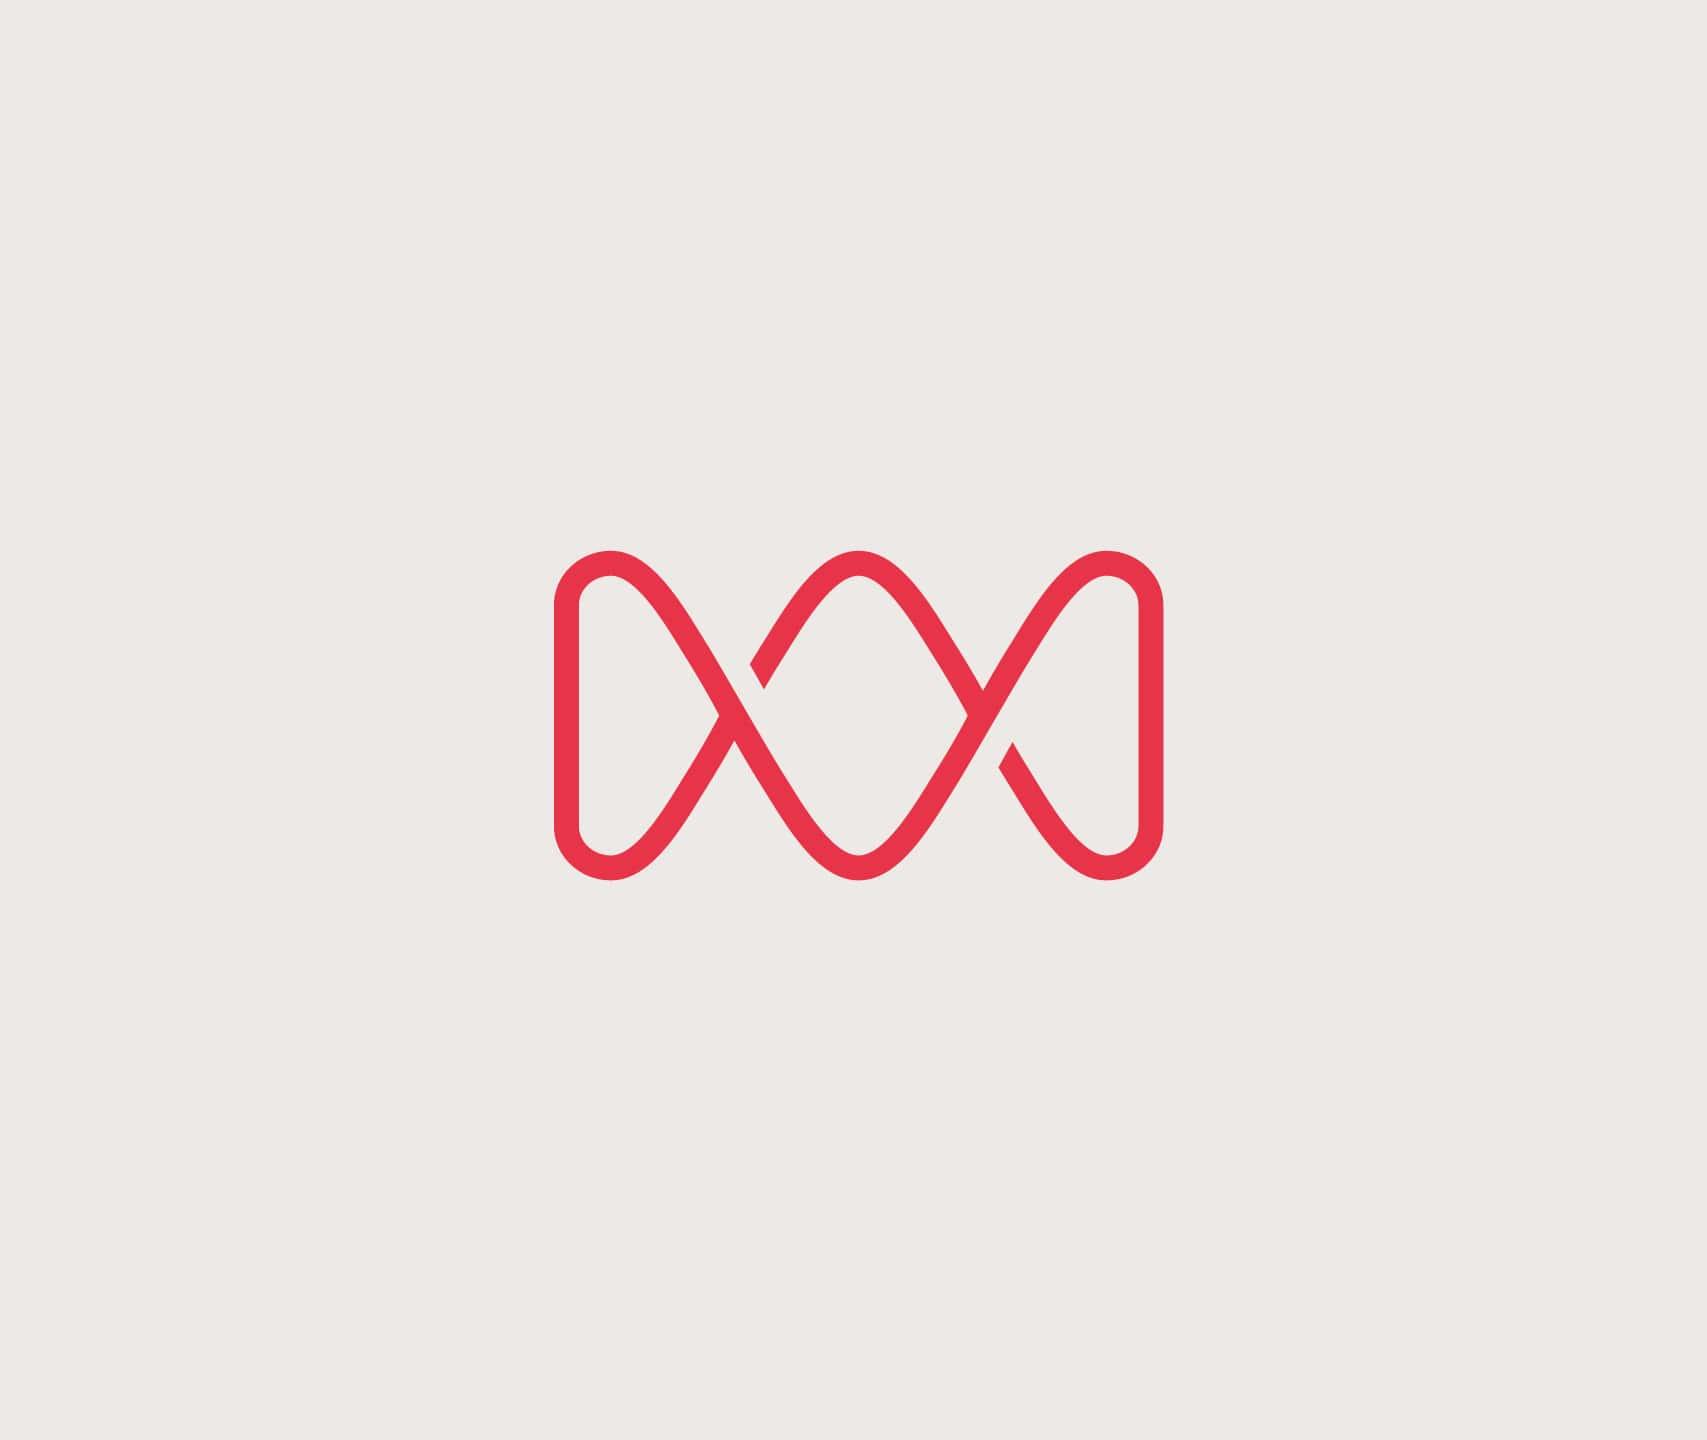 mantik-digital-branding-development-agency-creative-app-ui-web-branding-25-min-2